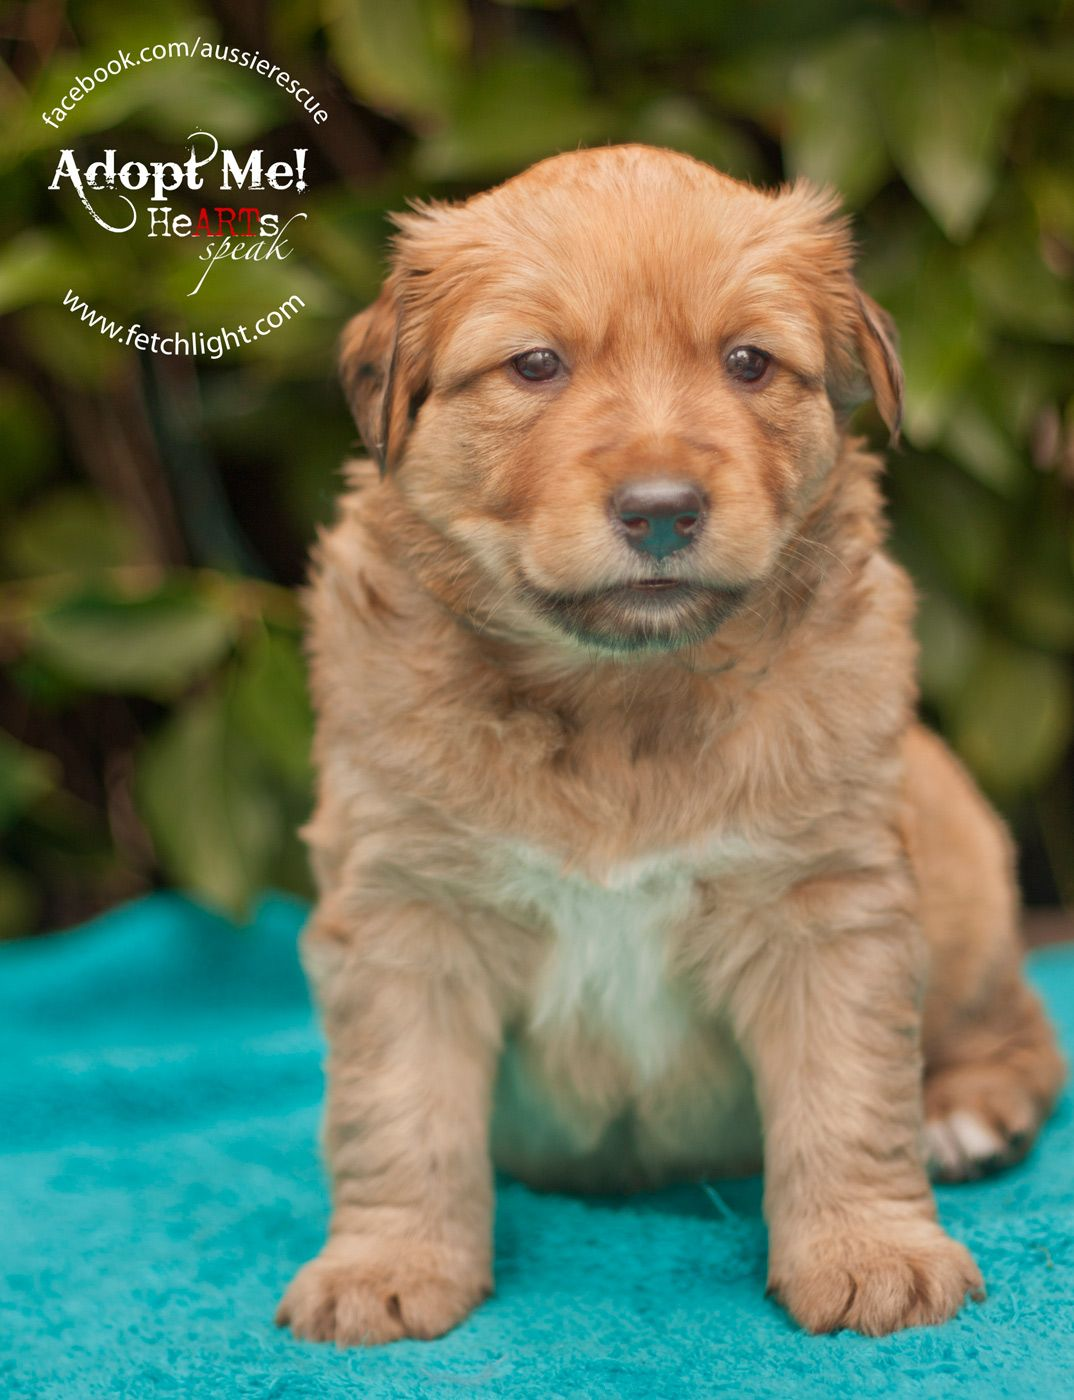 Tank is an adoptable puppy from Aussie Rescue San Diego